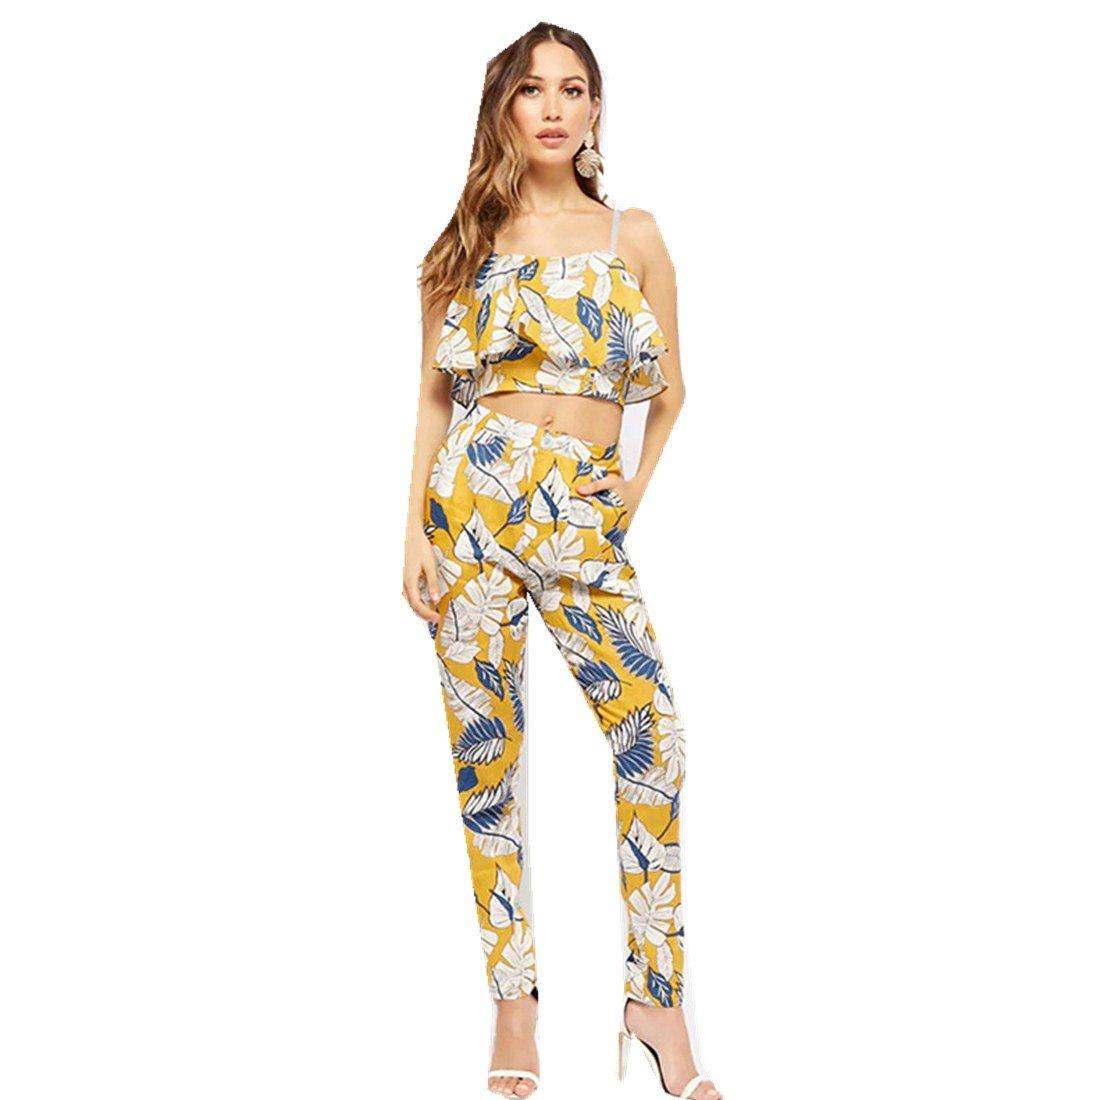 MV Women New Irregular Sling Petal Top Printing Feet Pants Two-Piece